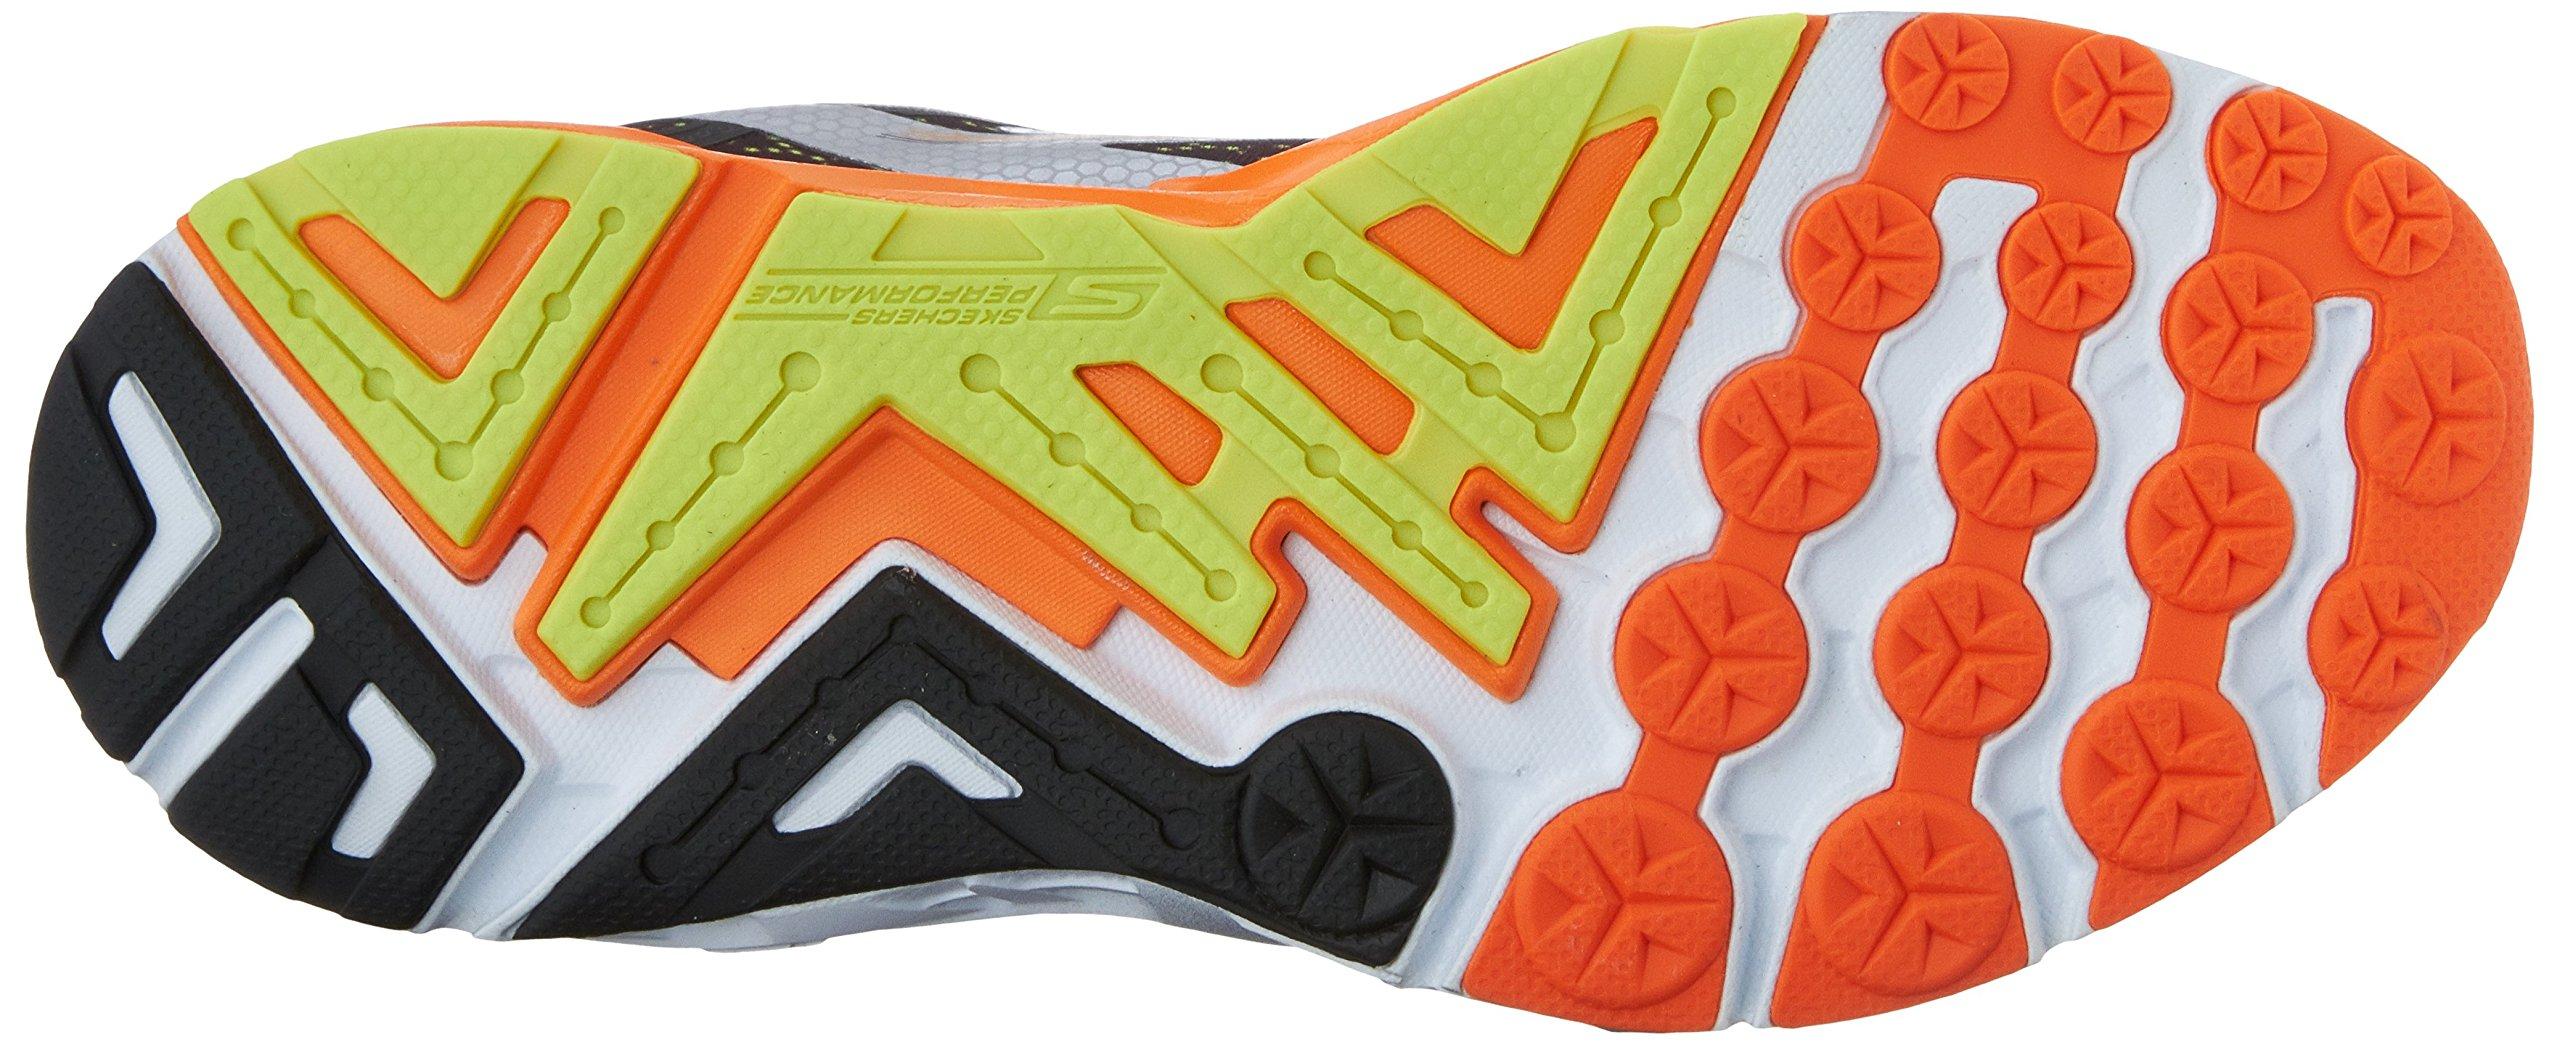 81KXDy1diNL - Skechers Men's Go Forza Running Shoes